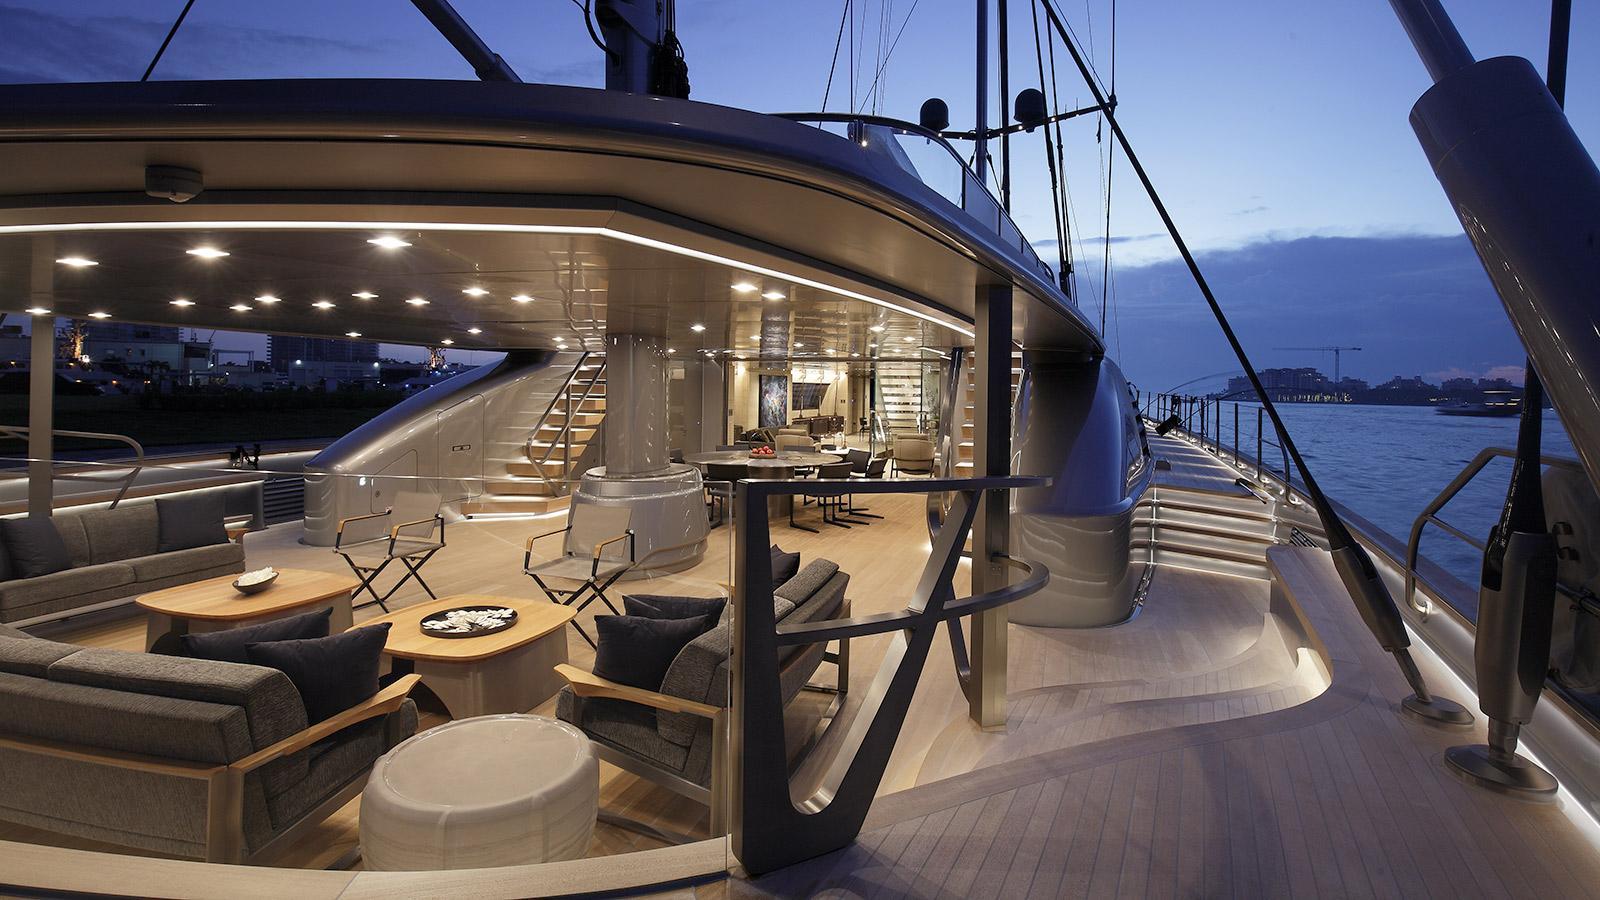 sybaris sailing yacht perini navi 2016 70m aft deck